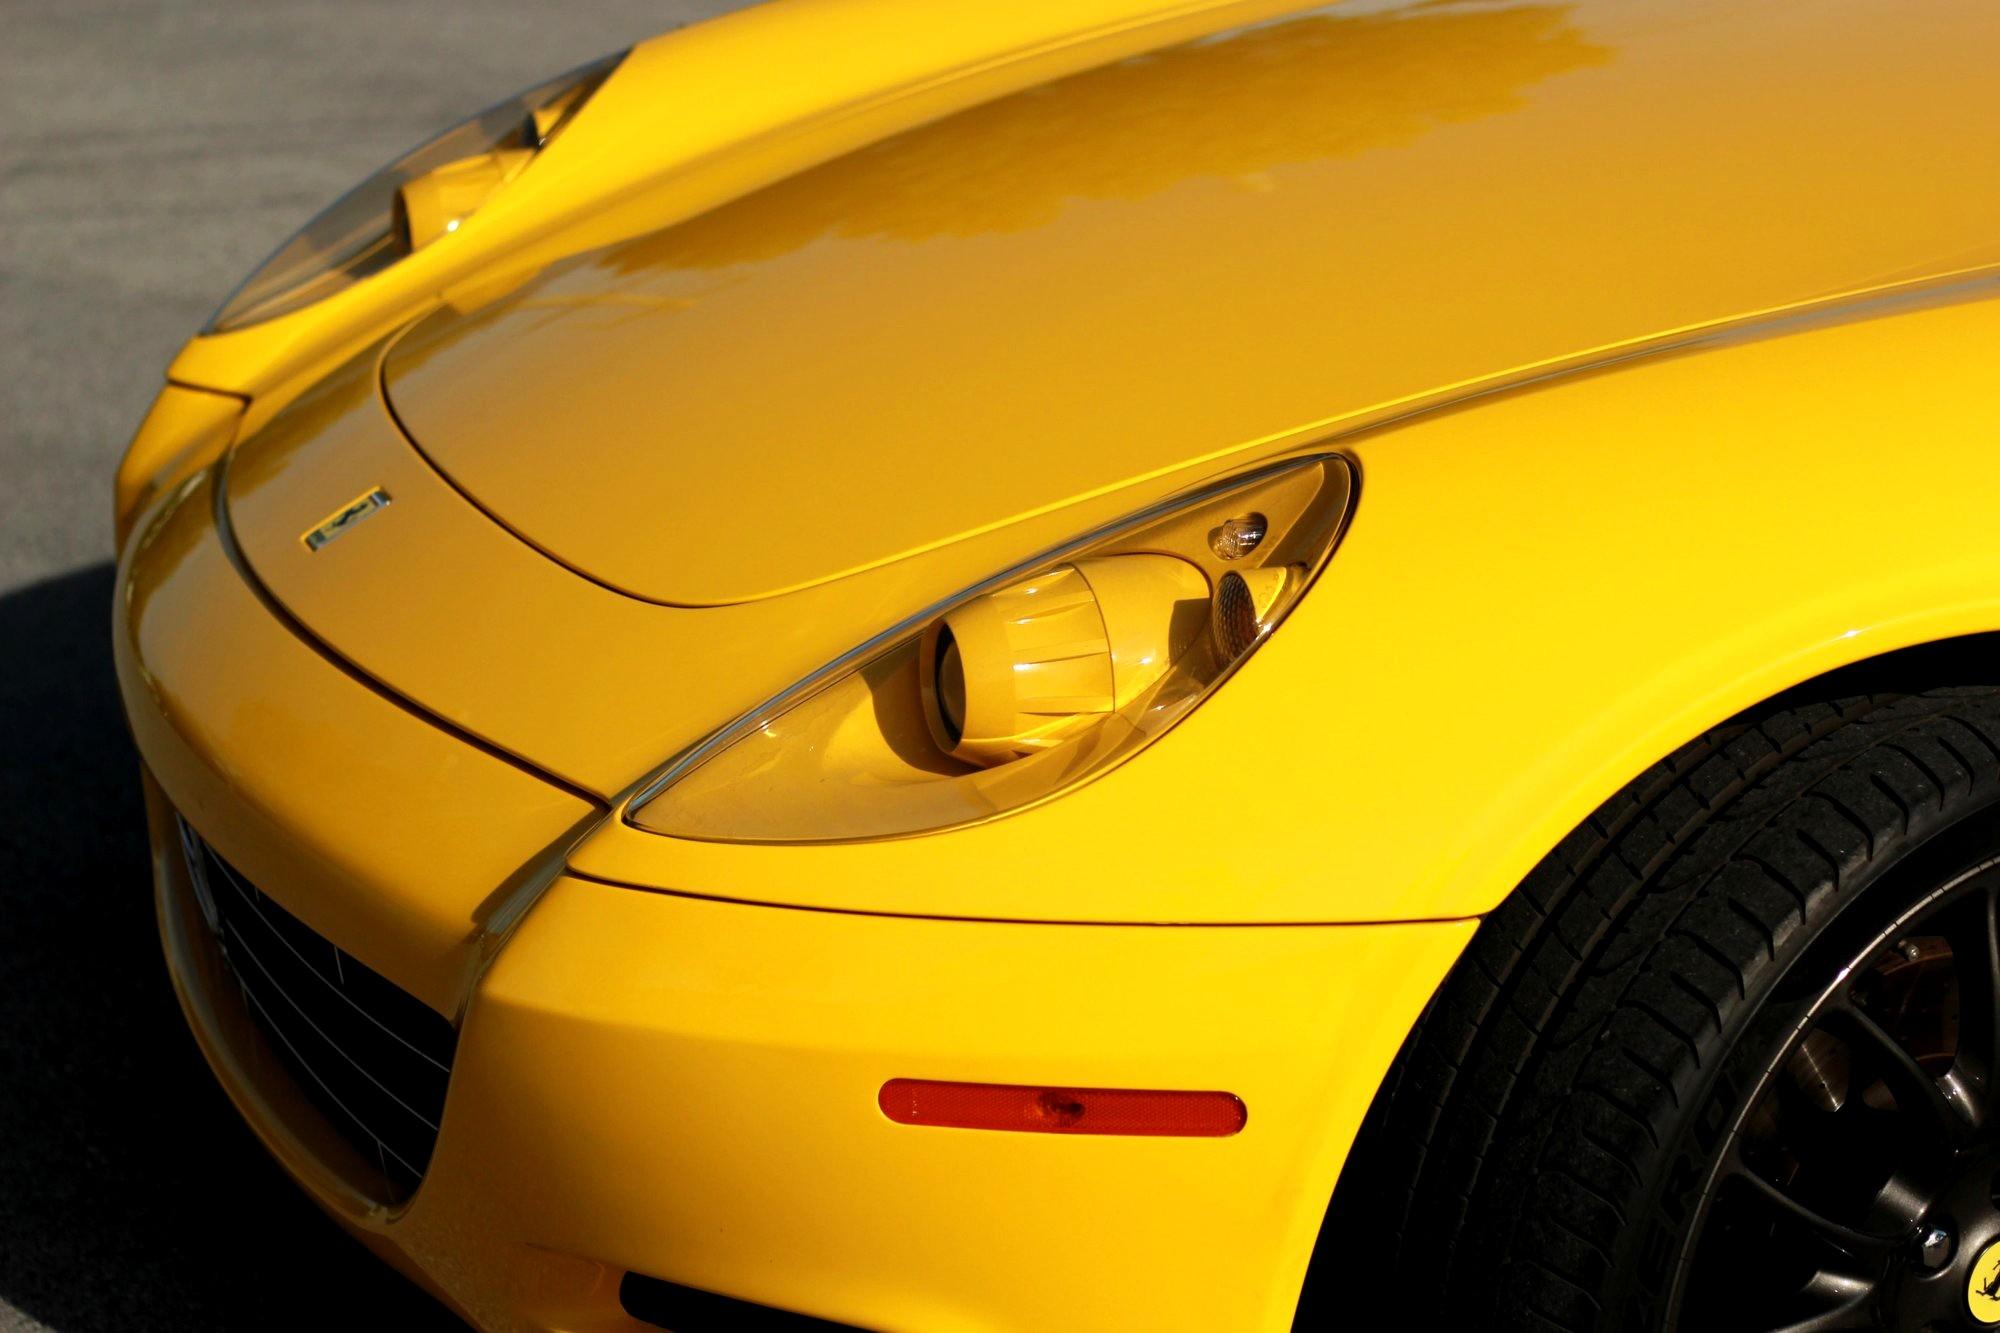 Best exotic cars under 100,000 and under 50,000:2006 Ferrari 612 Scaglietti, Doral, FL, USA, $96,499.